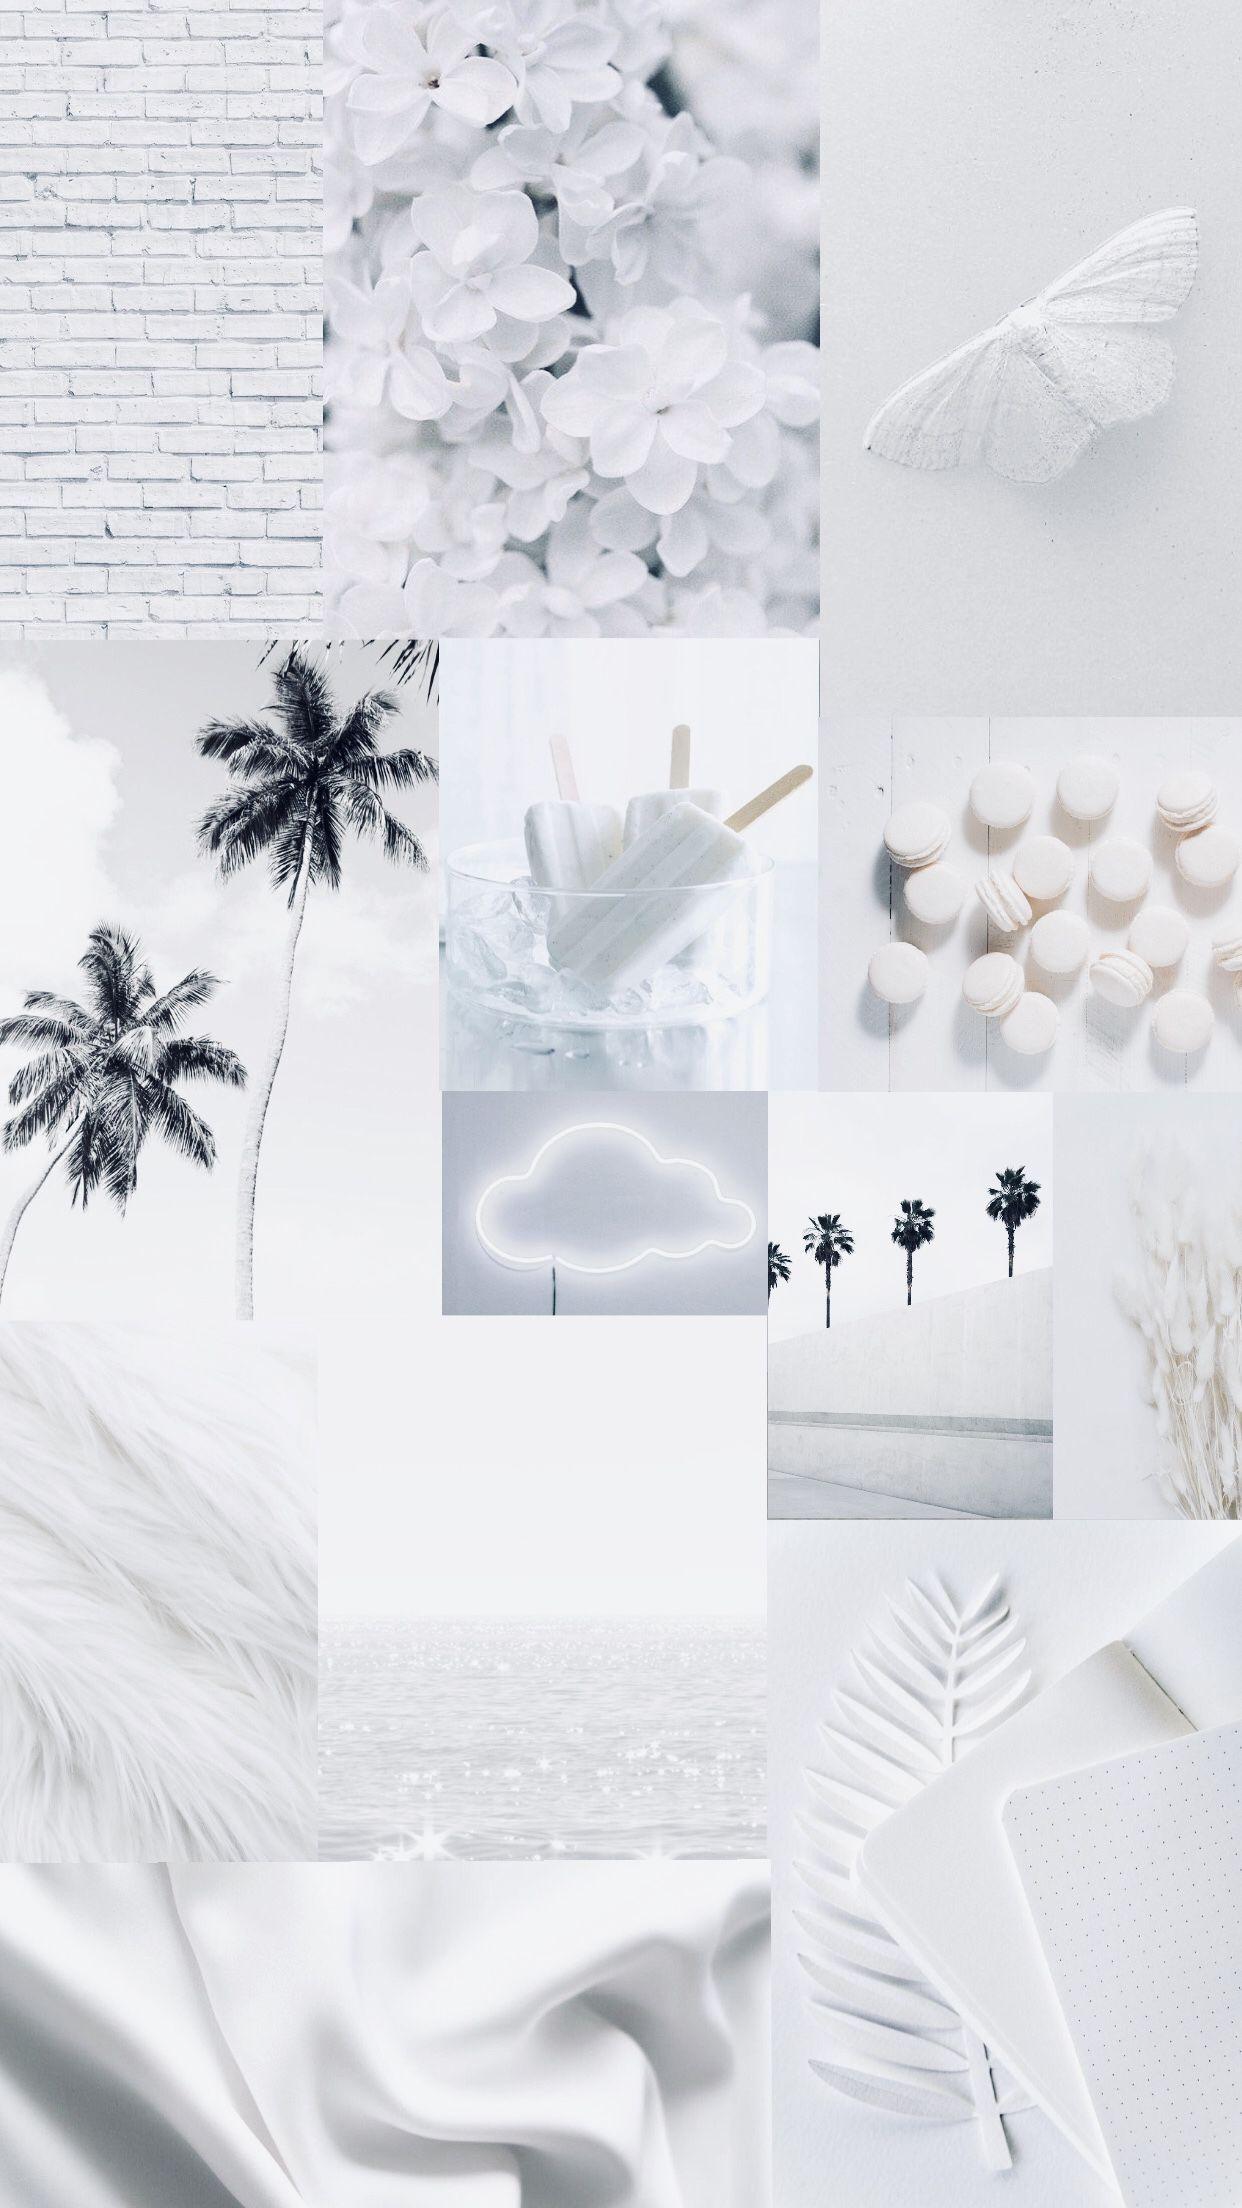 White In 2020 Iphone Wallpaper Tumblr Aesthetic Iphone Wallpaper Girly Iphone Wallpaper Landscape